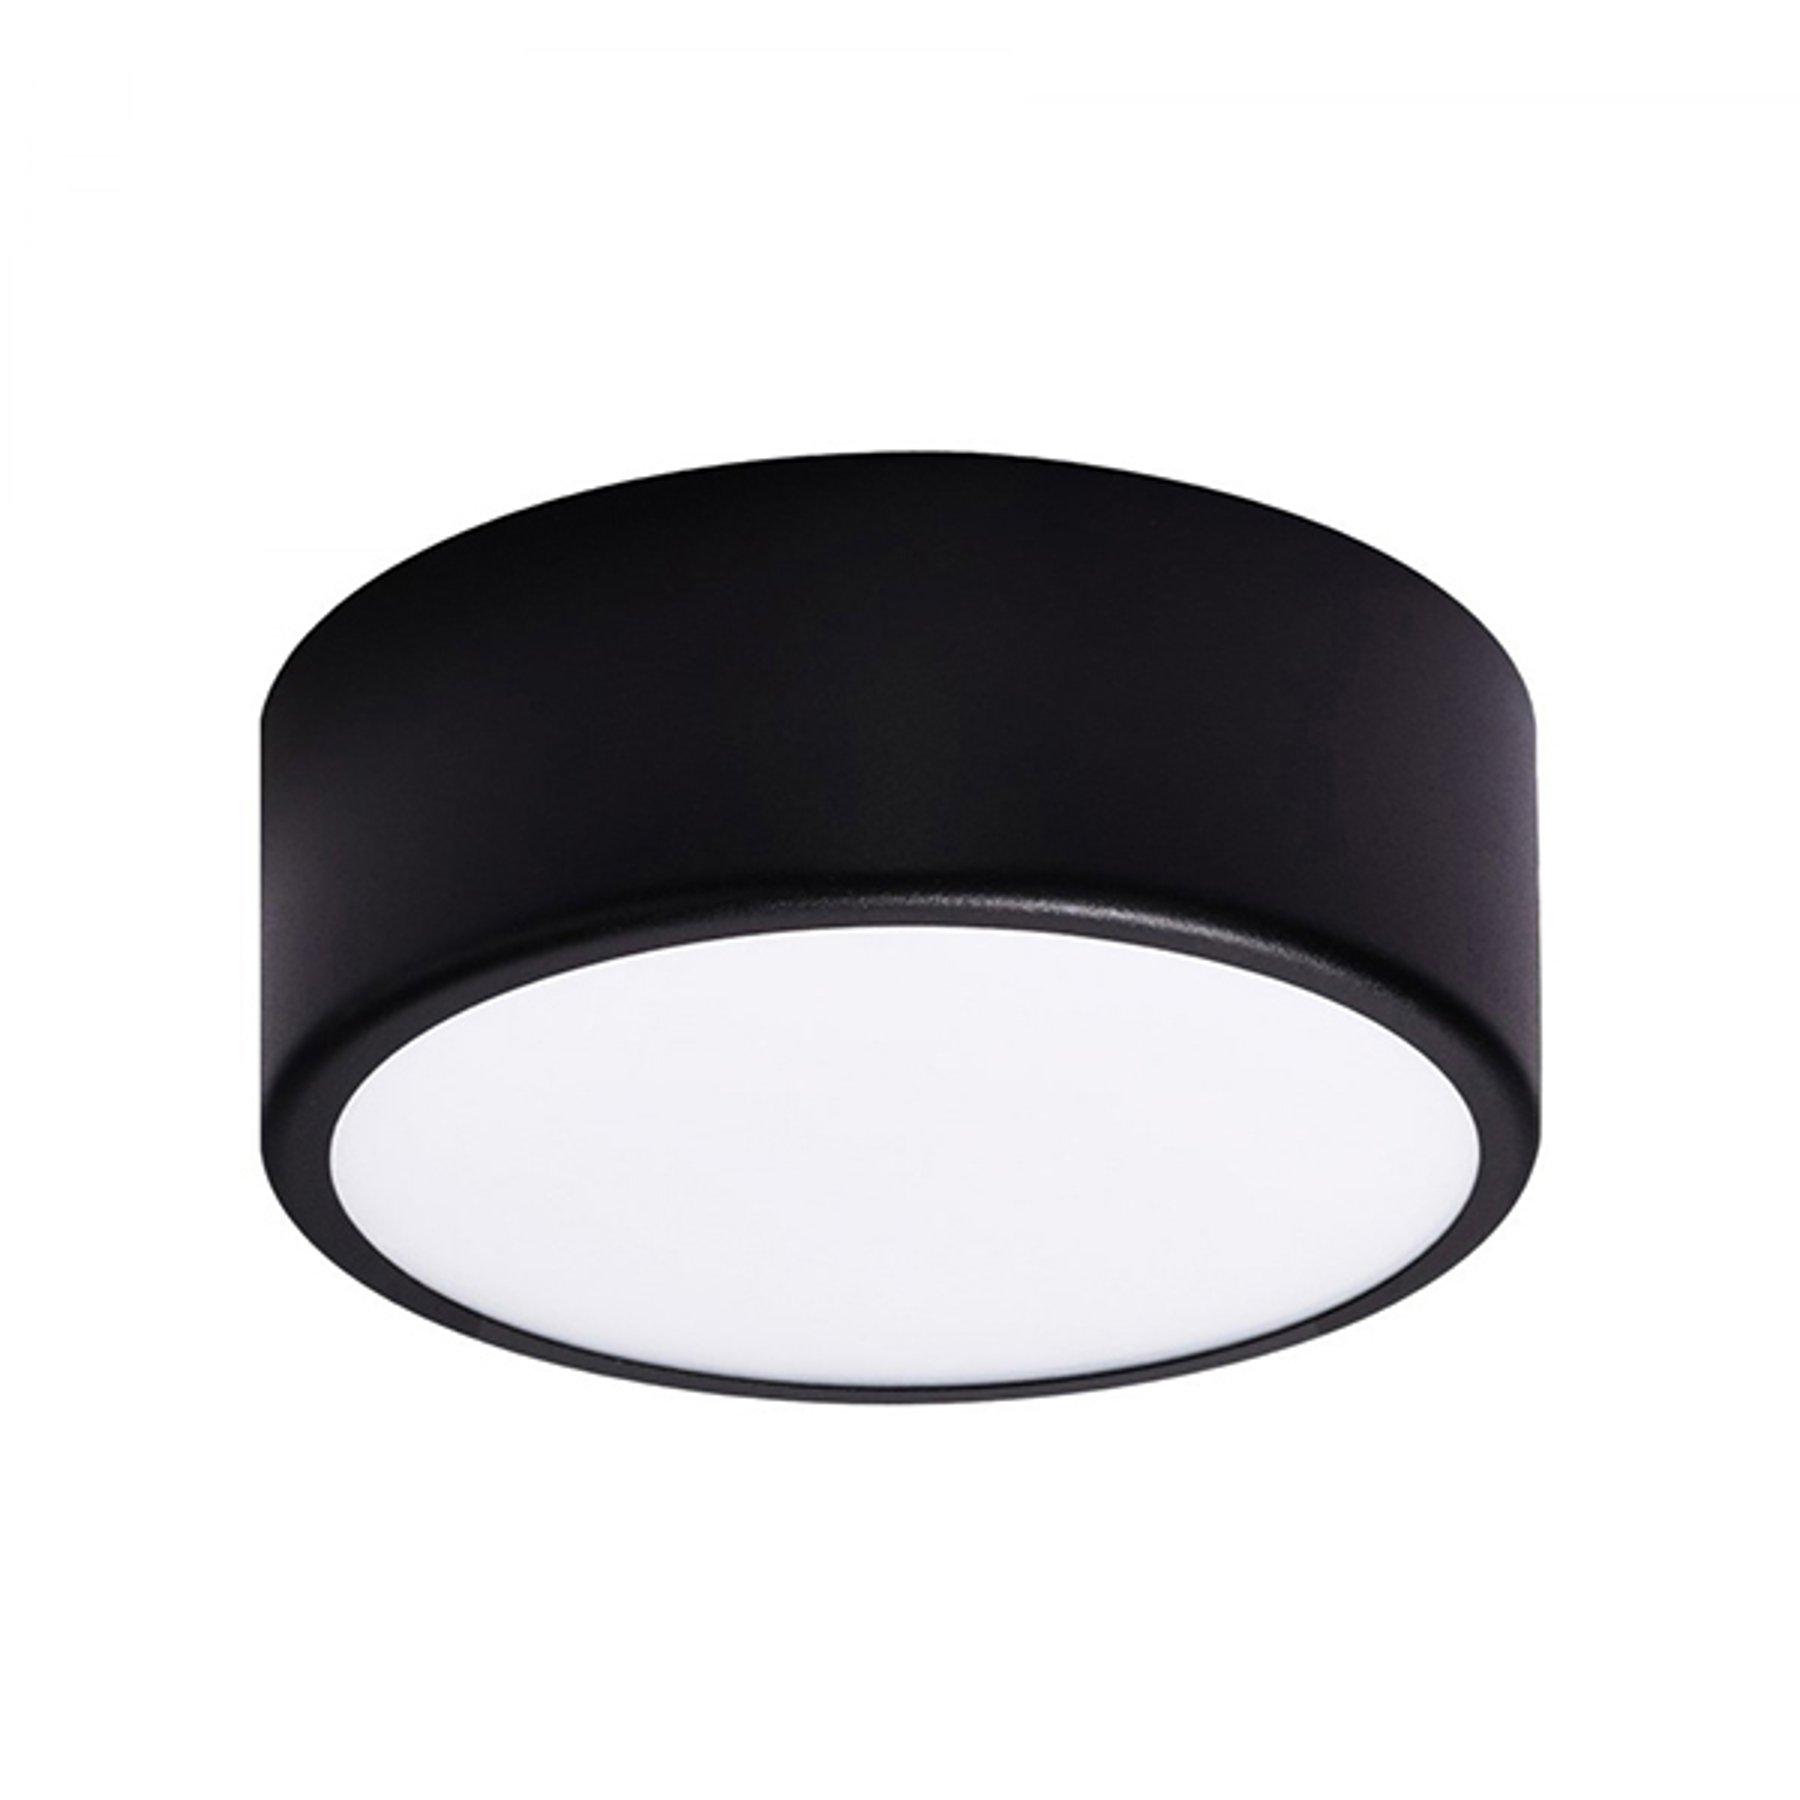 Taklampe Cleo, Ø 20 cm, svart